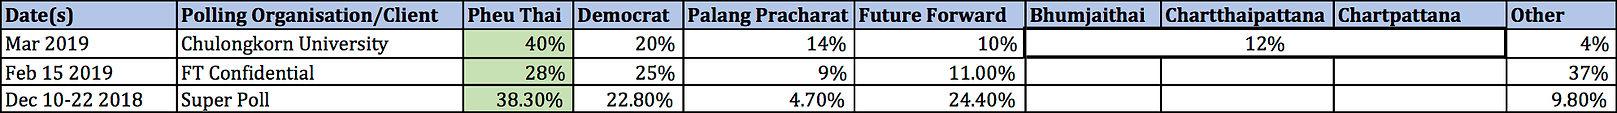 Thai polls 1 - national reputable.jpg